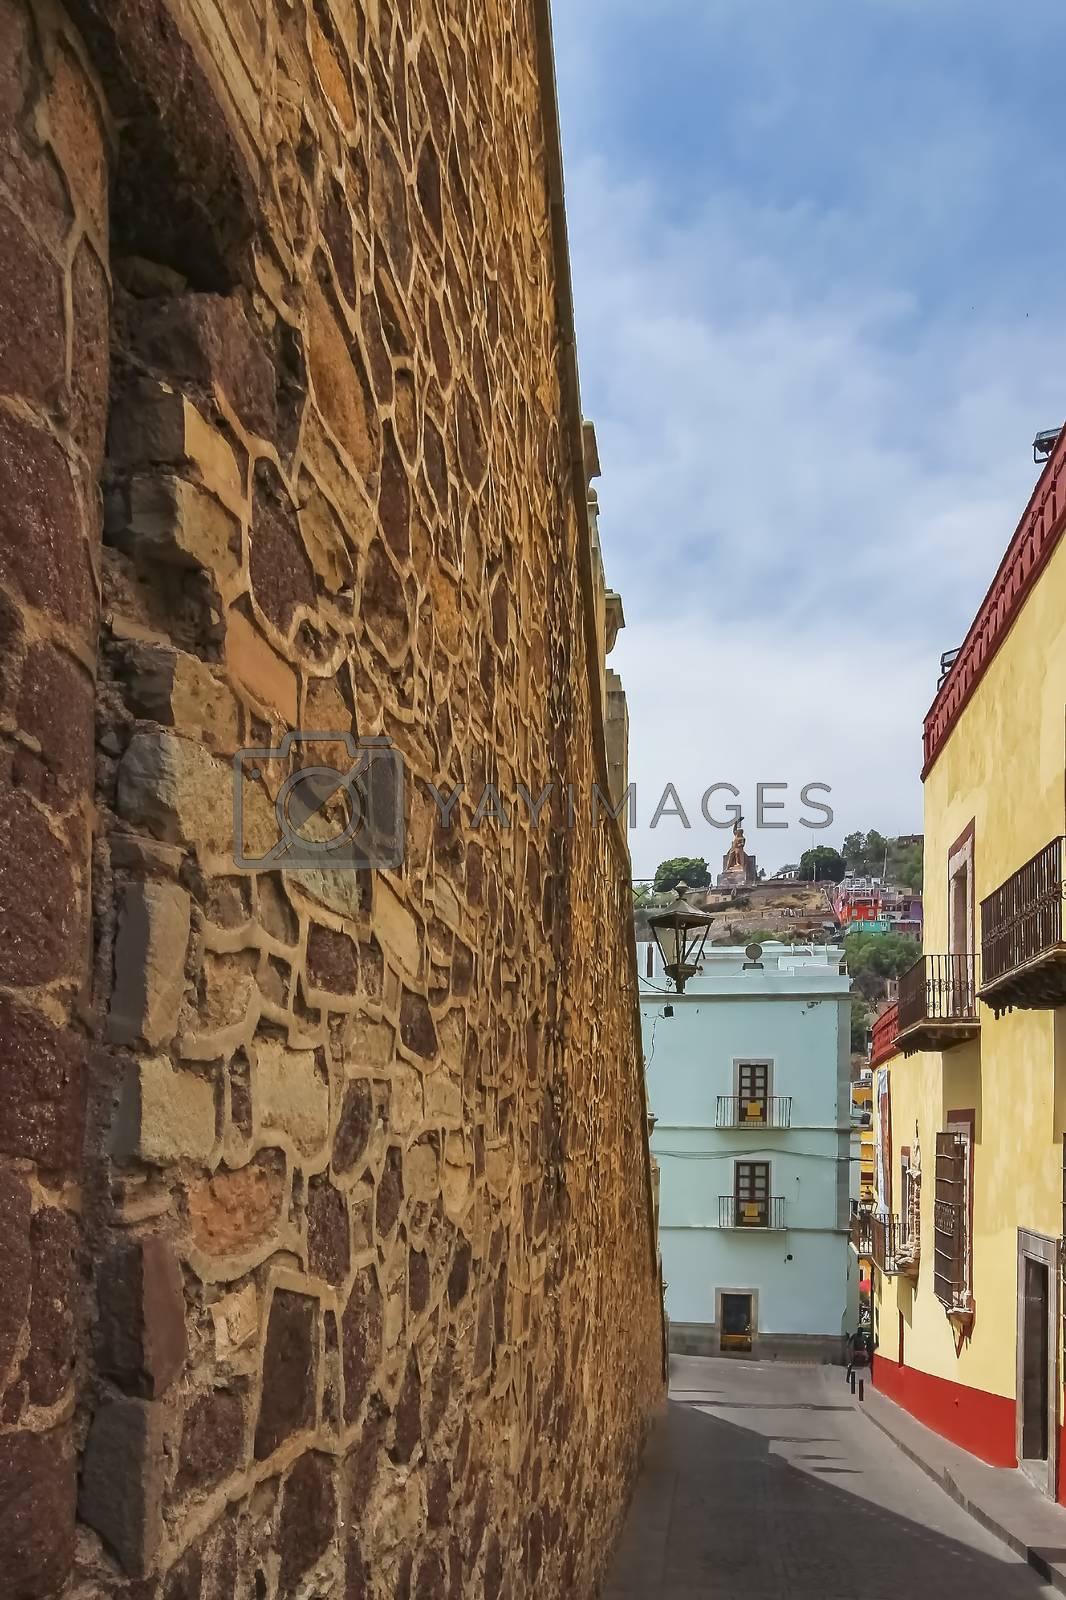 Brick wall at the side of the steps of the University of Guanajuato along Subida de Los Hospitales street